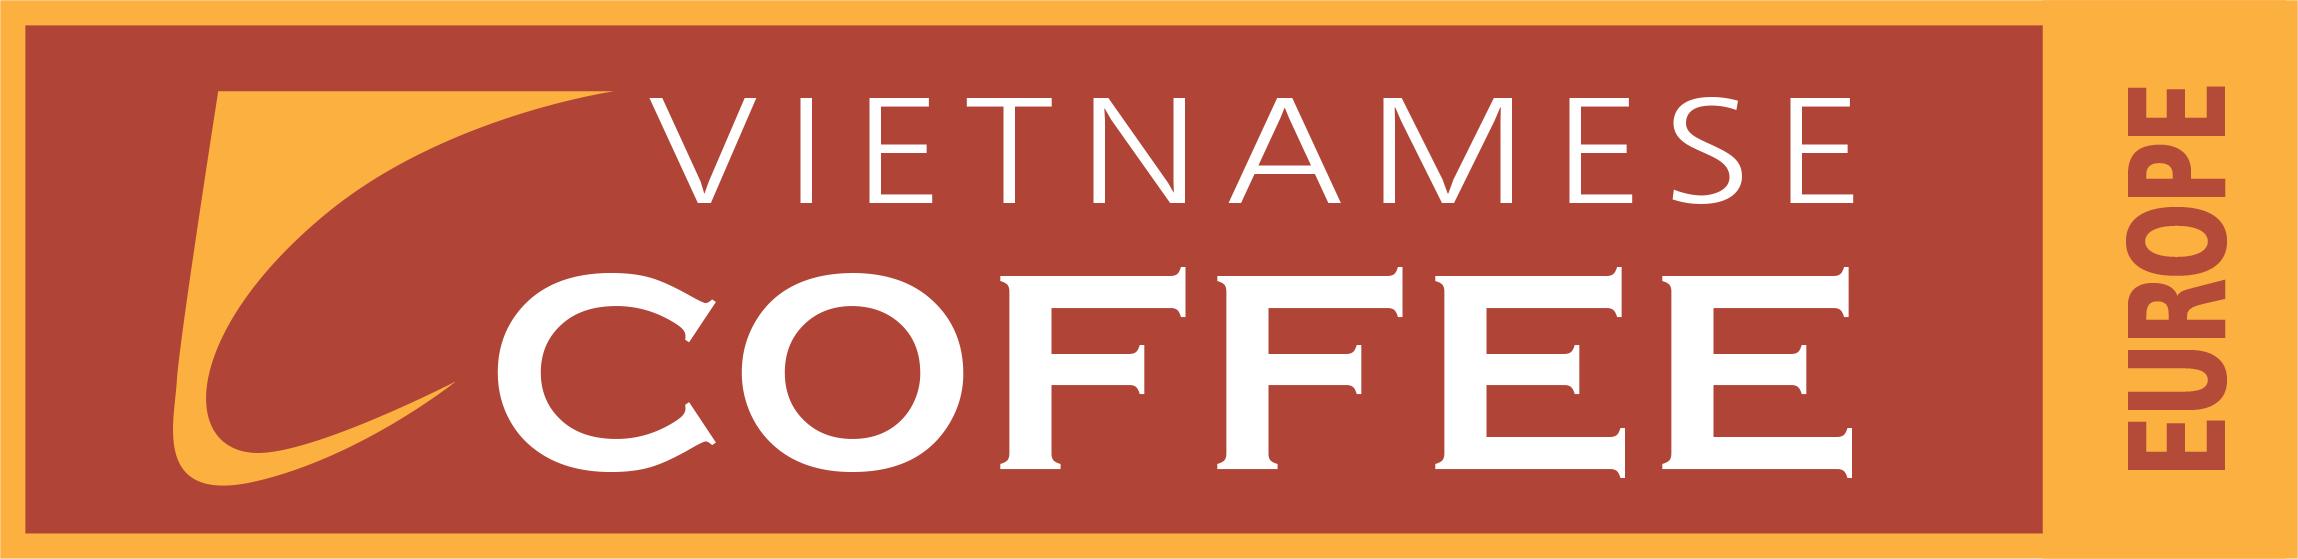 Premium Vietnamese Coffee Trung Nguyen in Europe